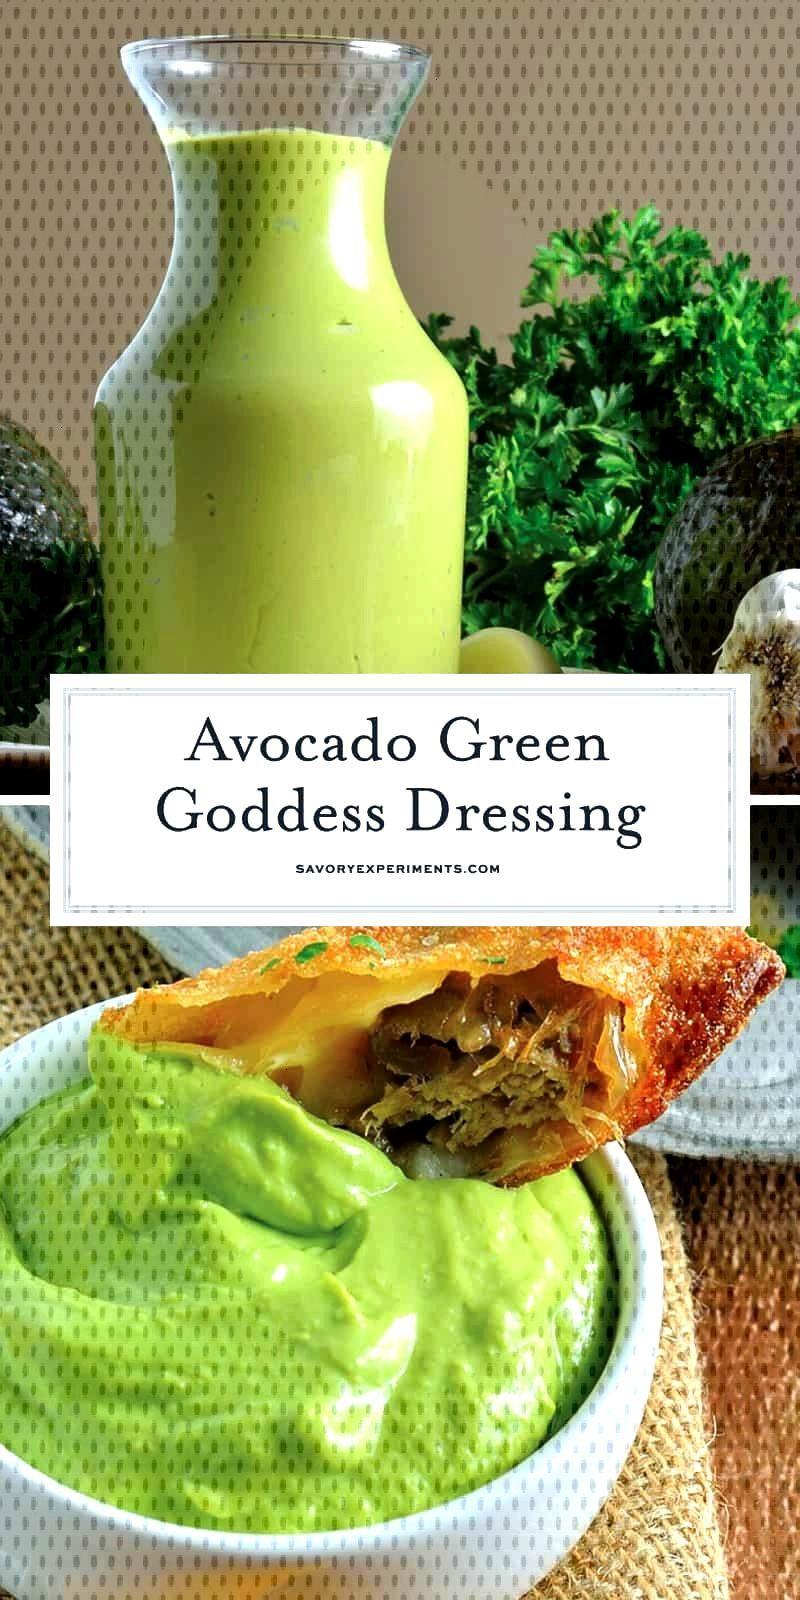 Avocado Green Goddess Dressing Avocado Green Goddess Dressing,